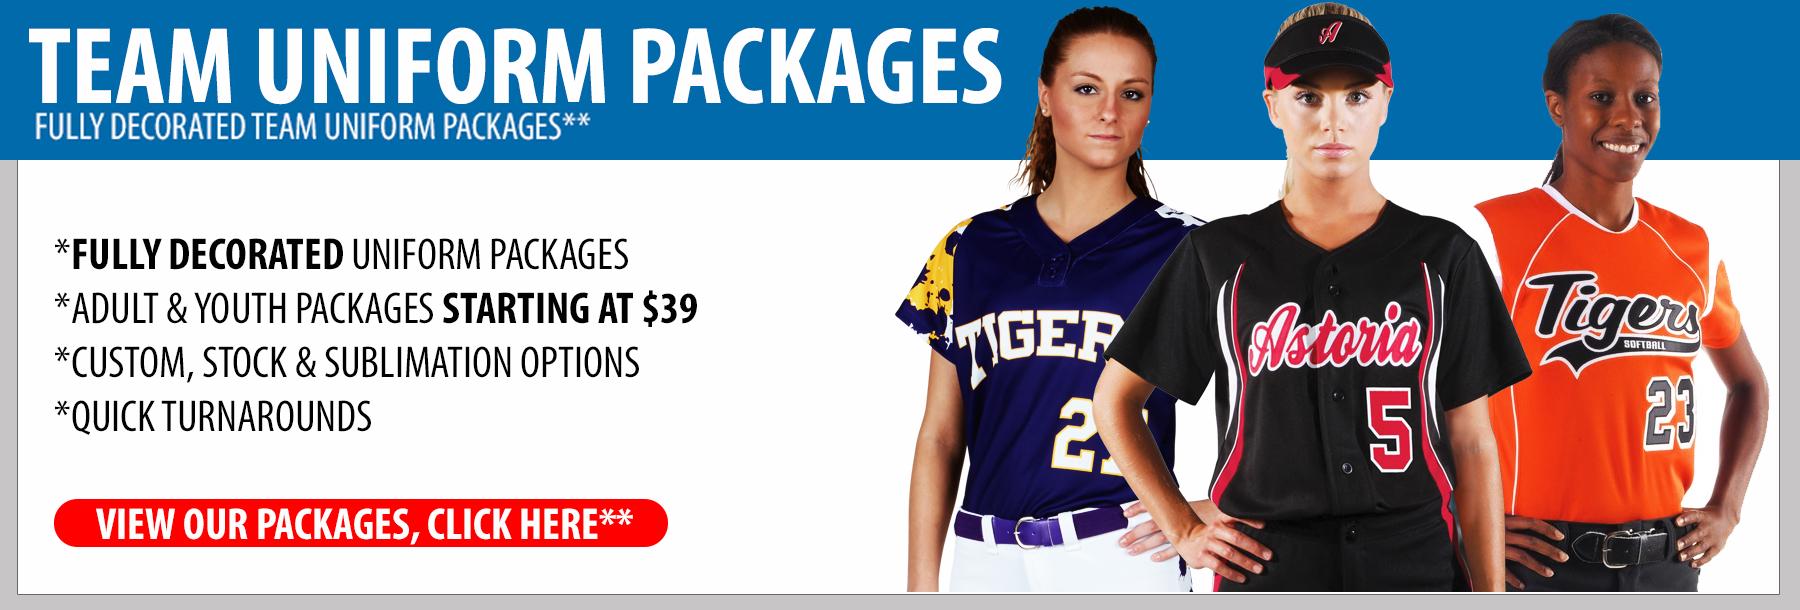 Womens Softball Uniform 108